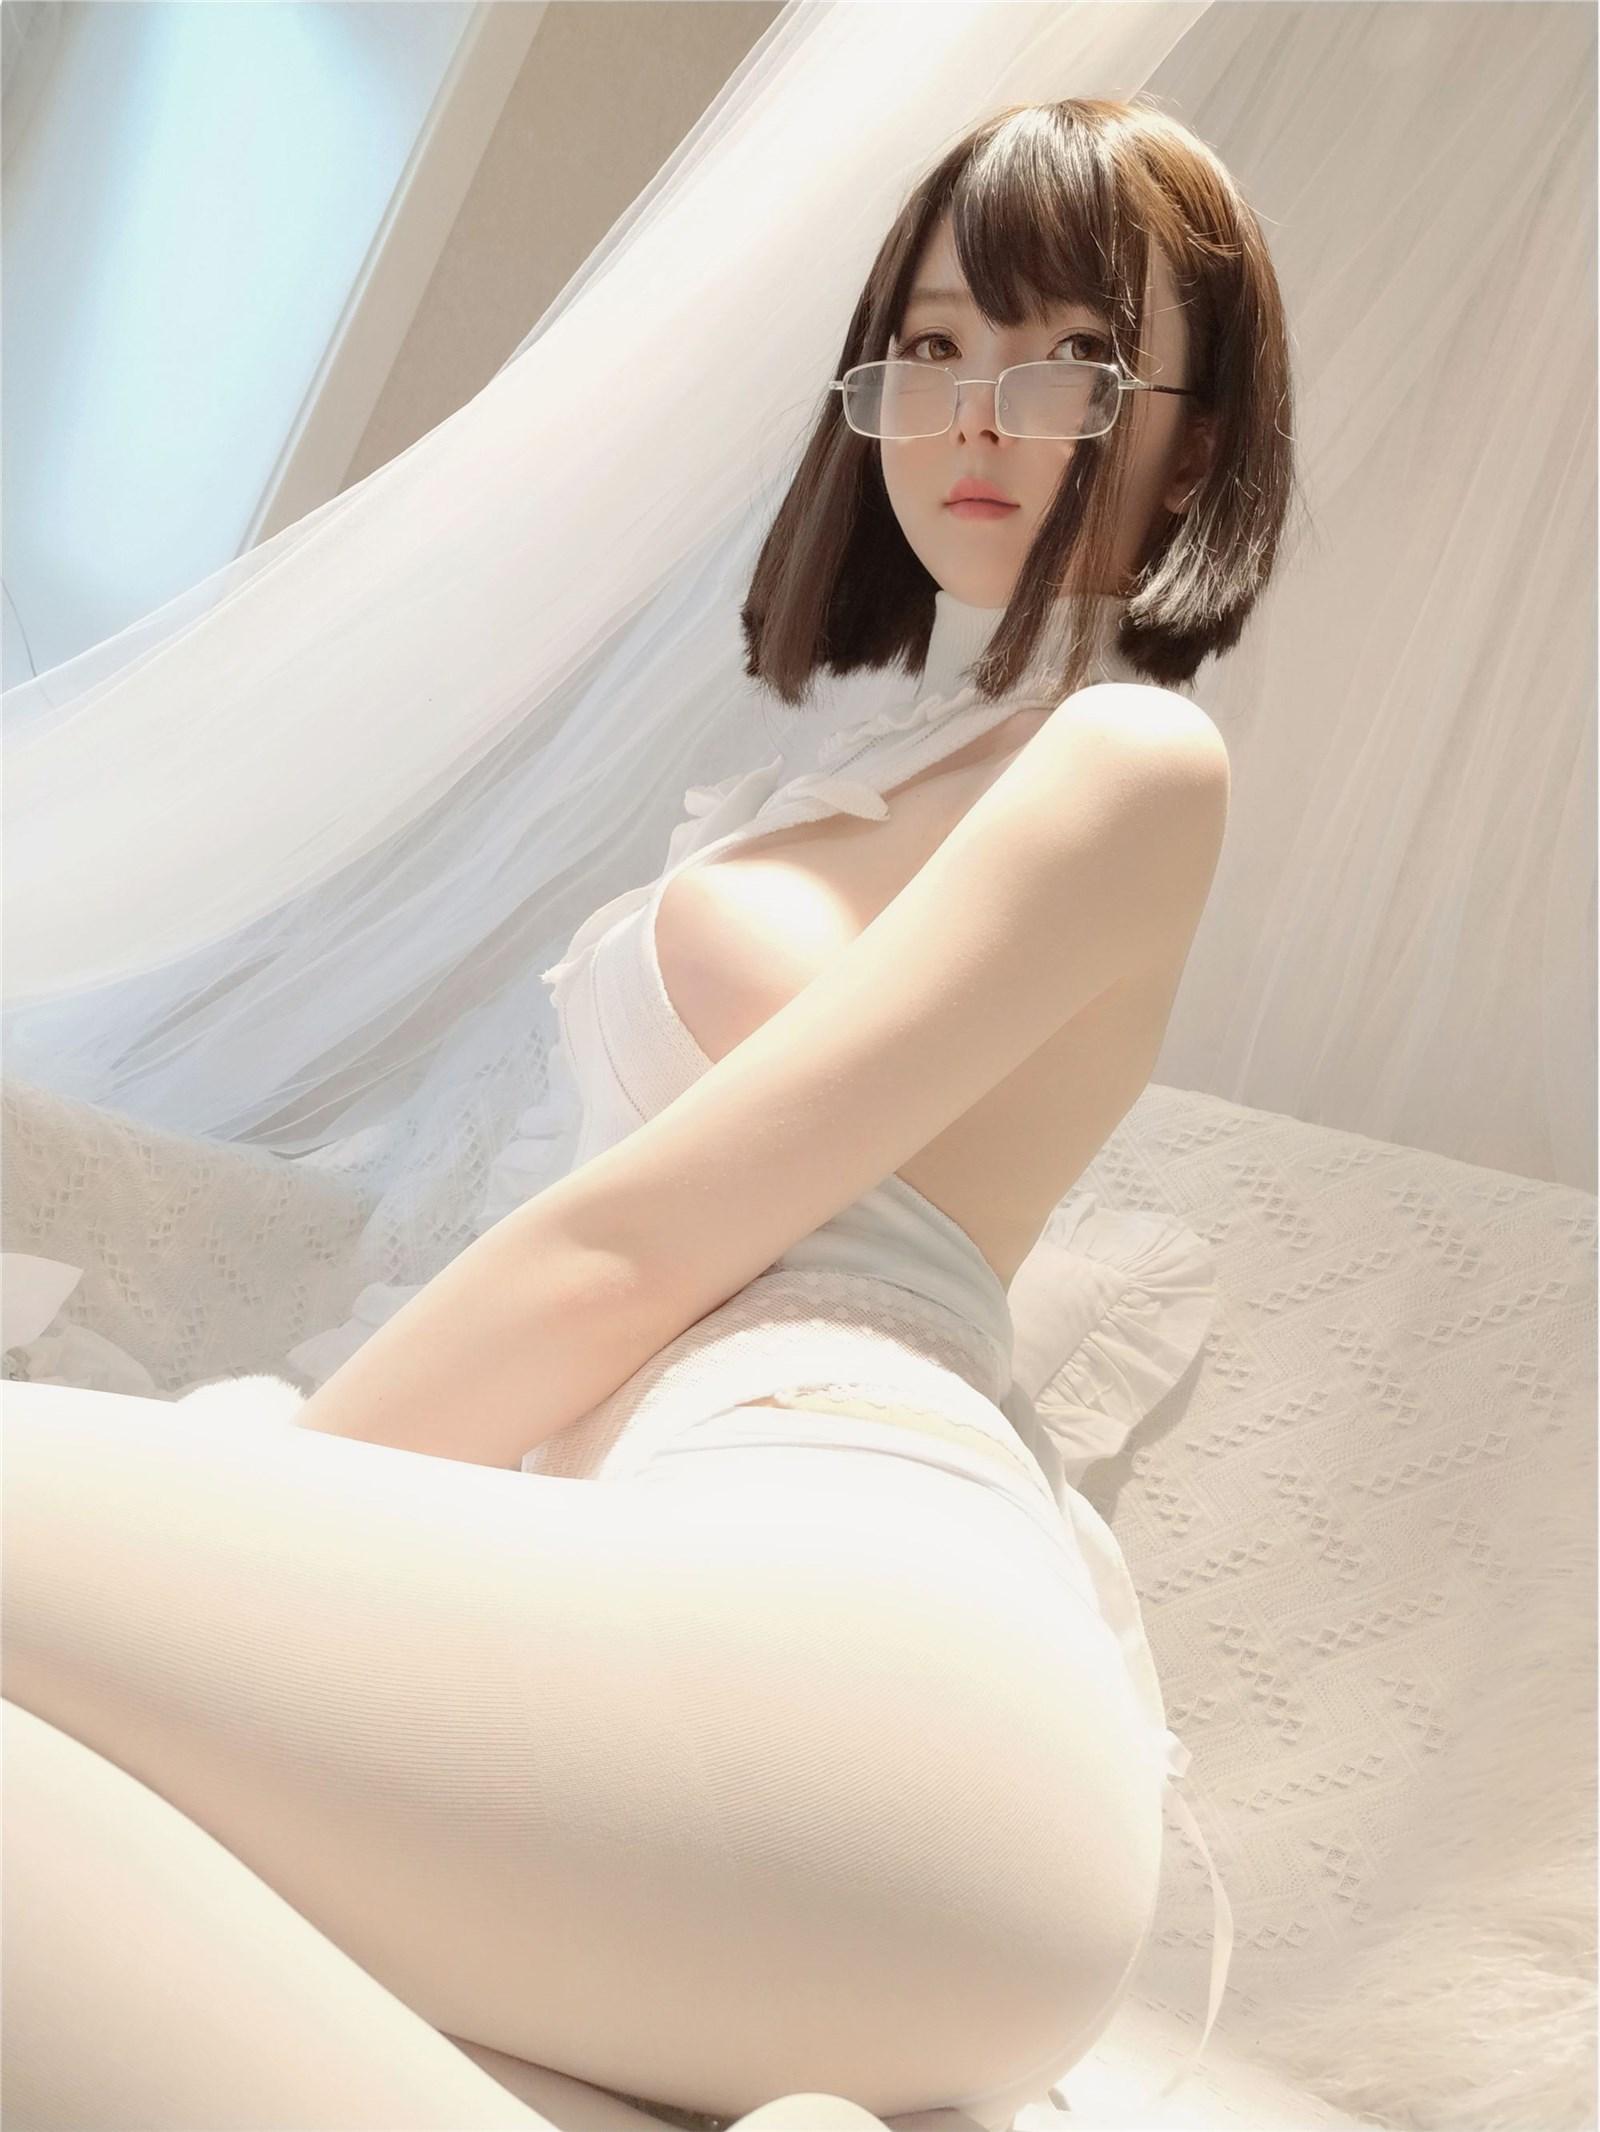 Cosplay 一小央泽 糯米元宵(101P)